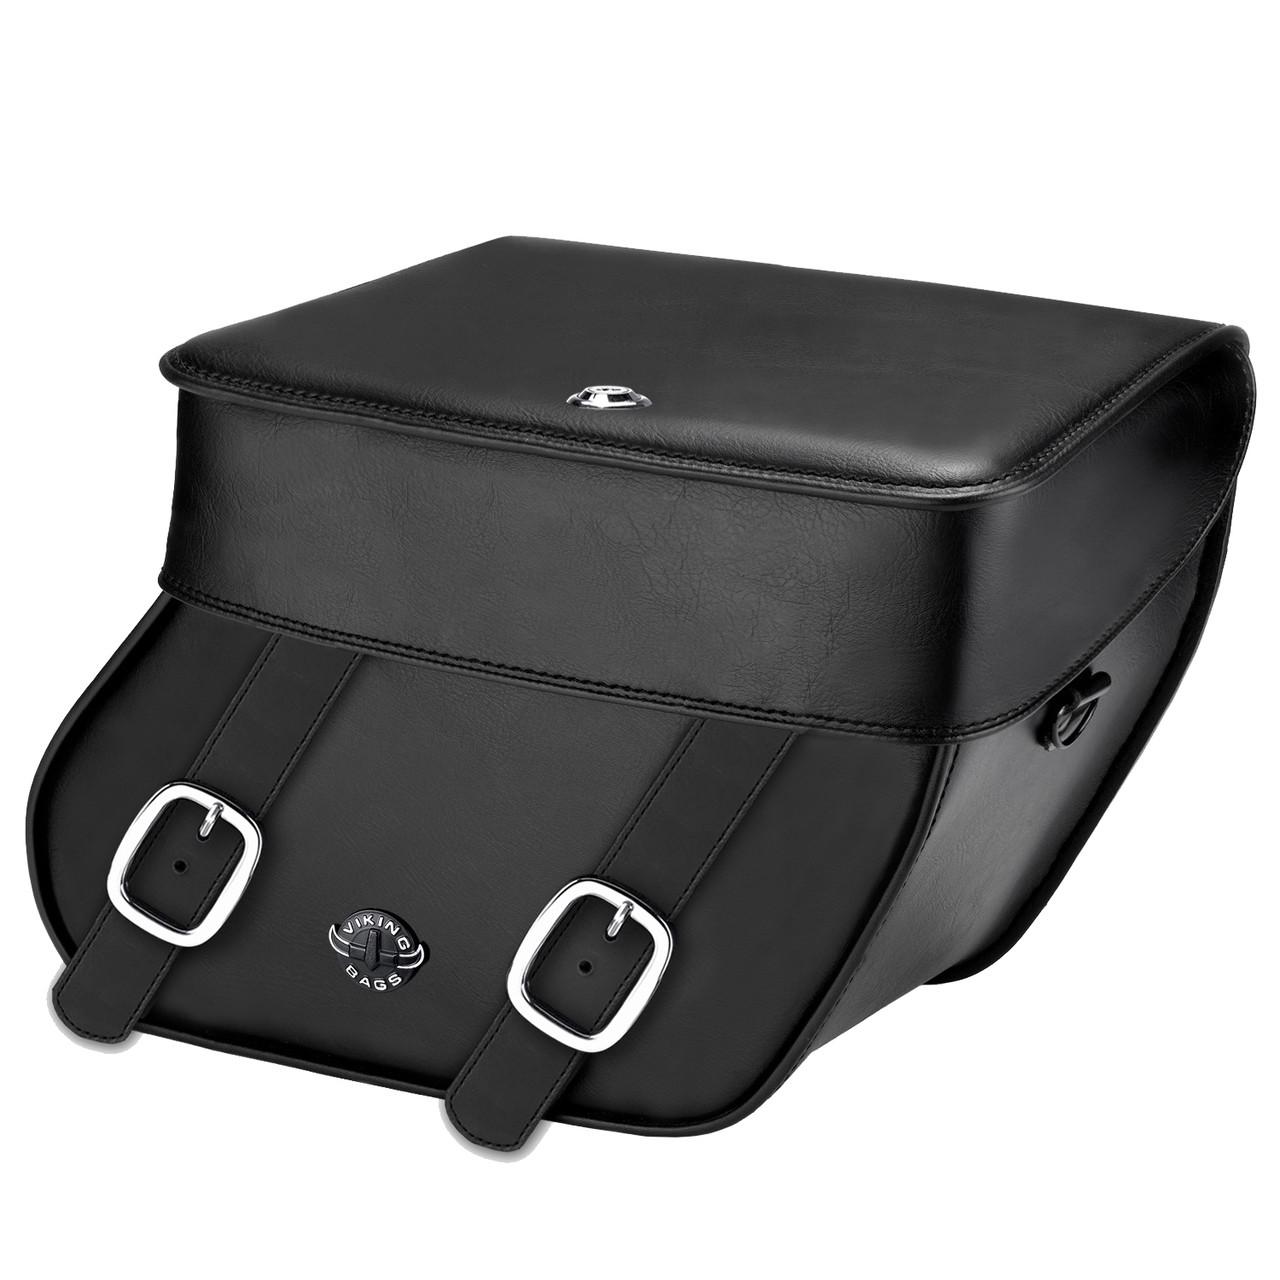 Concord Leather Saddlebags Main image